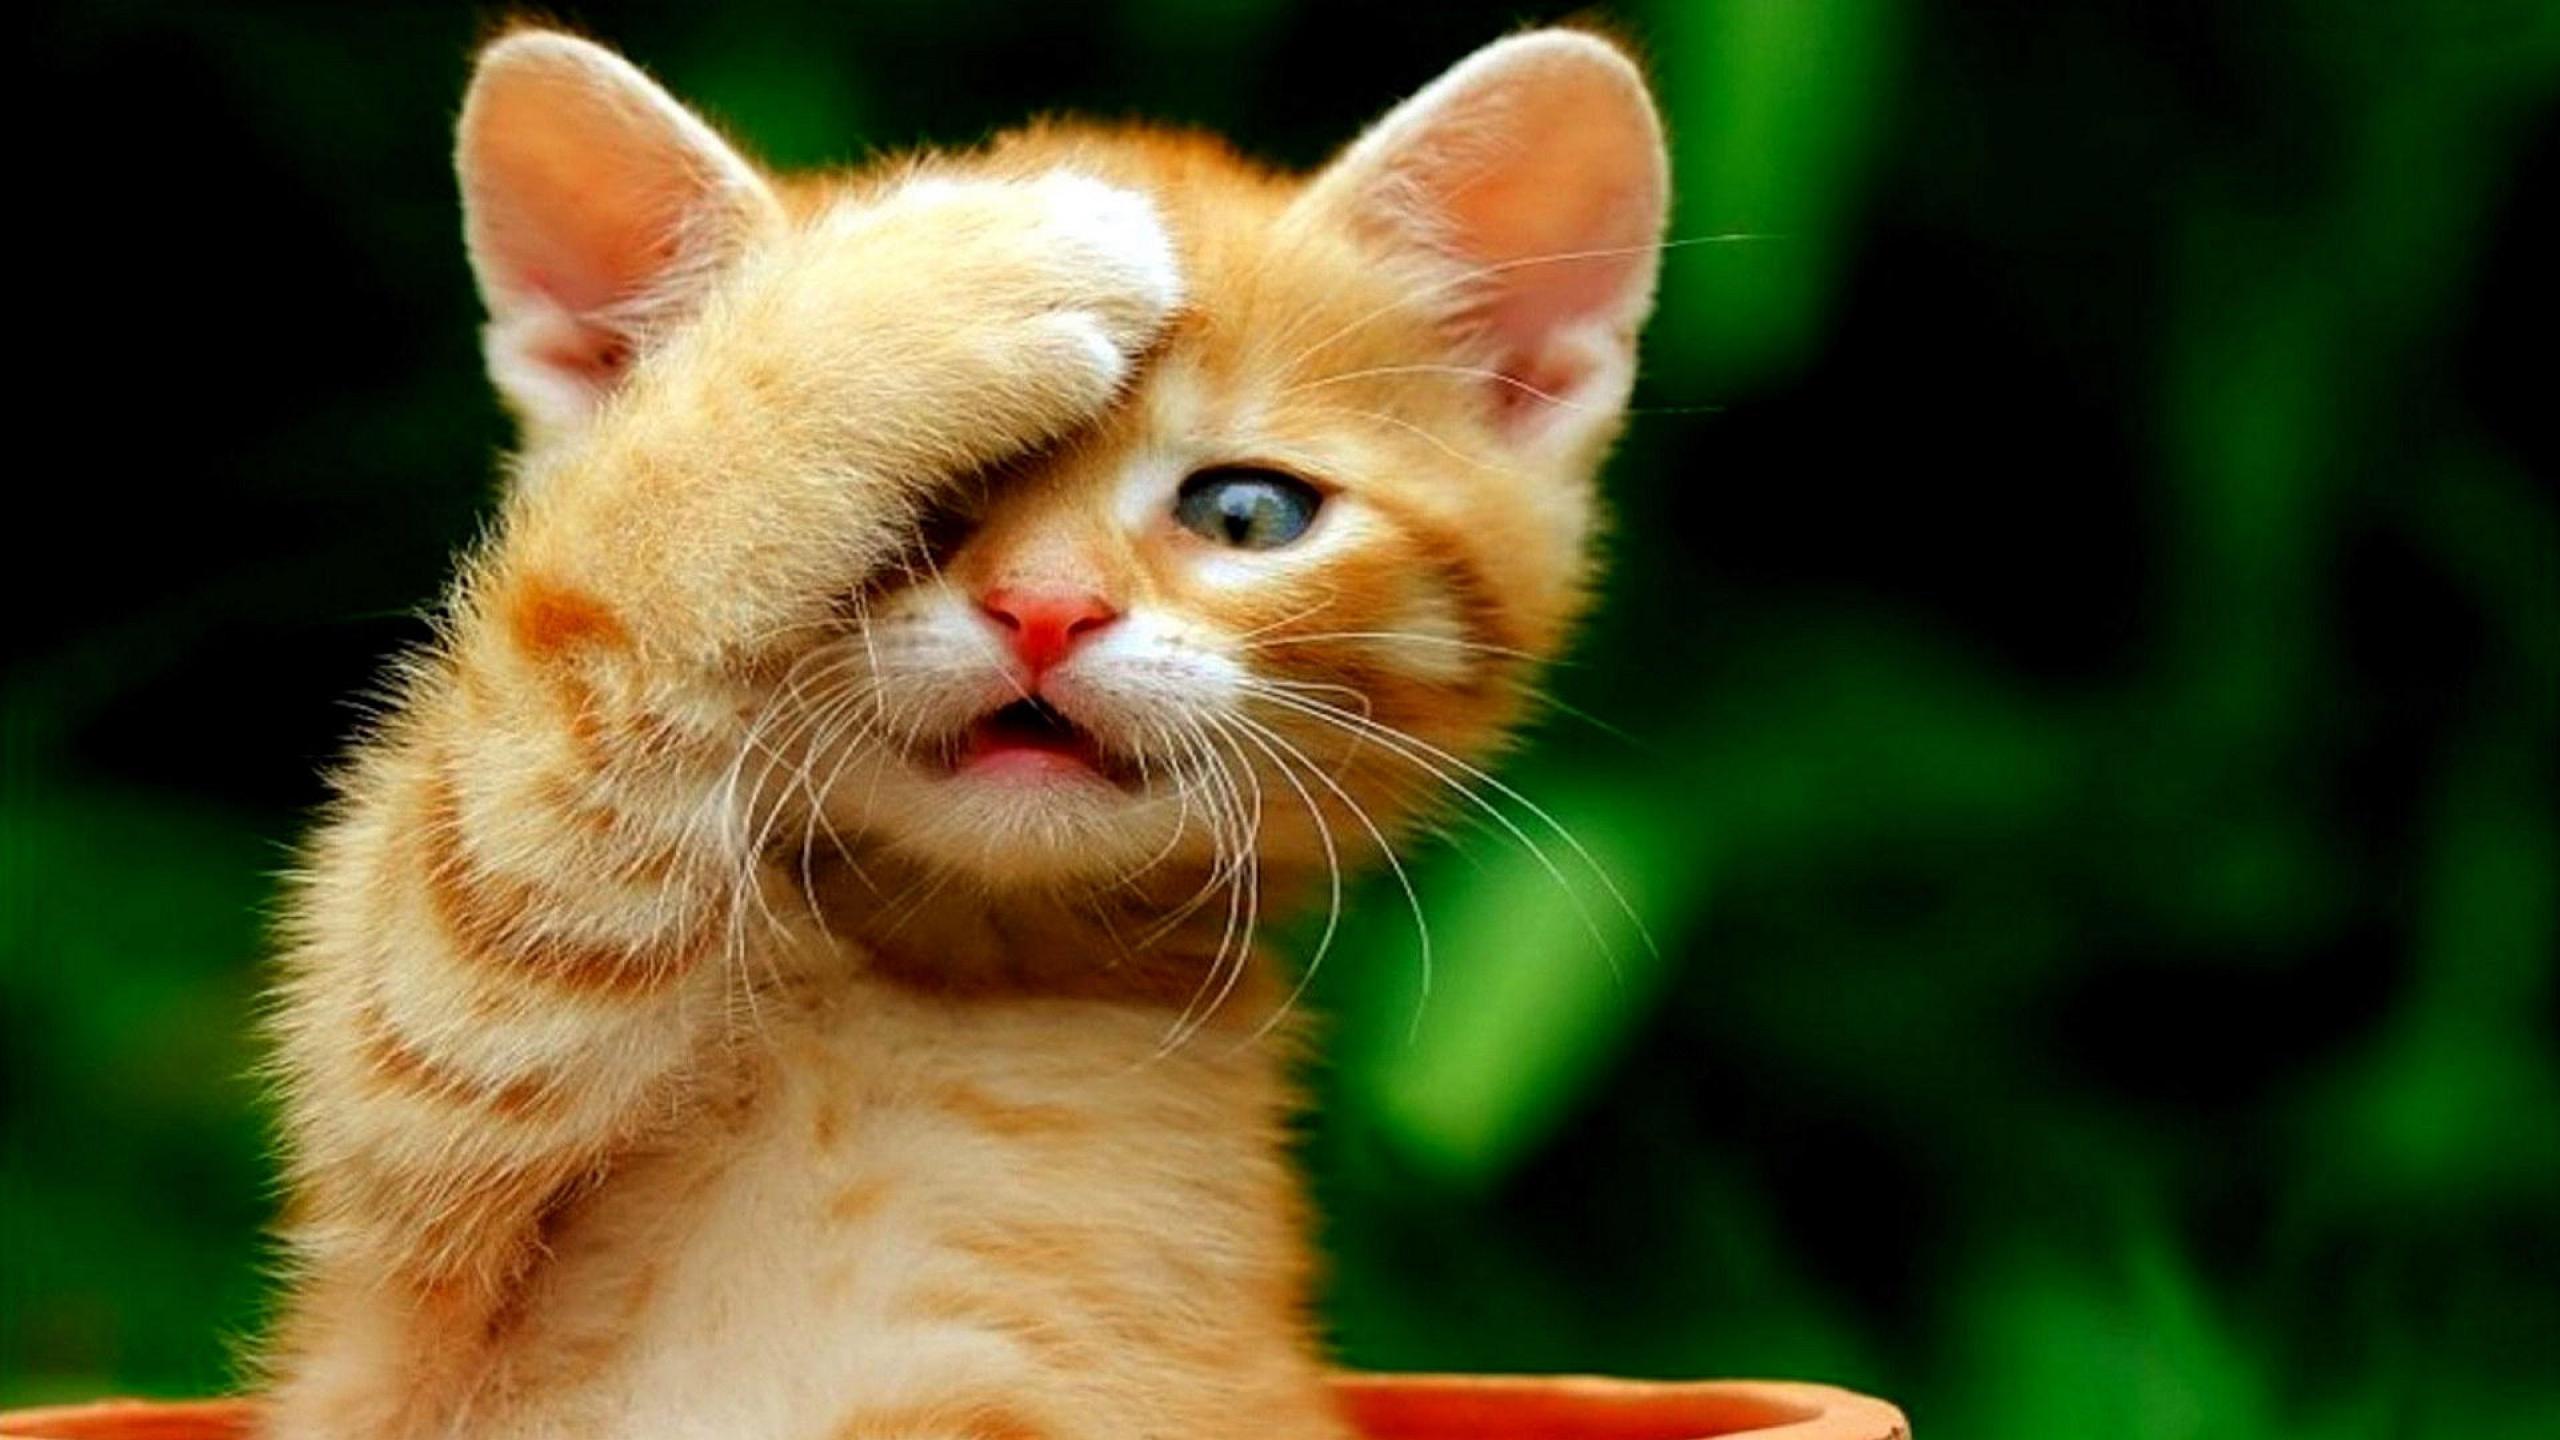 Cute Cat Images Hd 2560x1440 Wallpaper Teahub Io